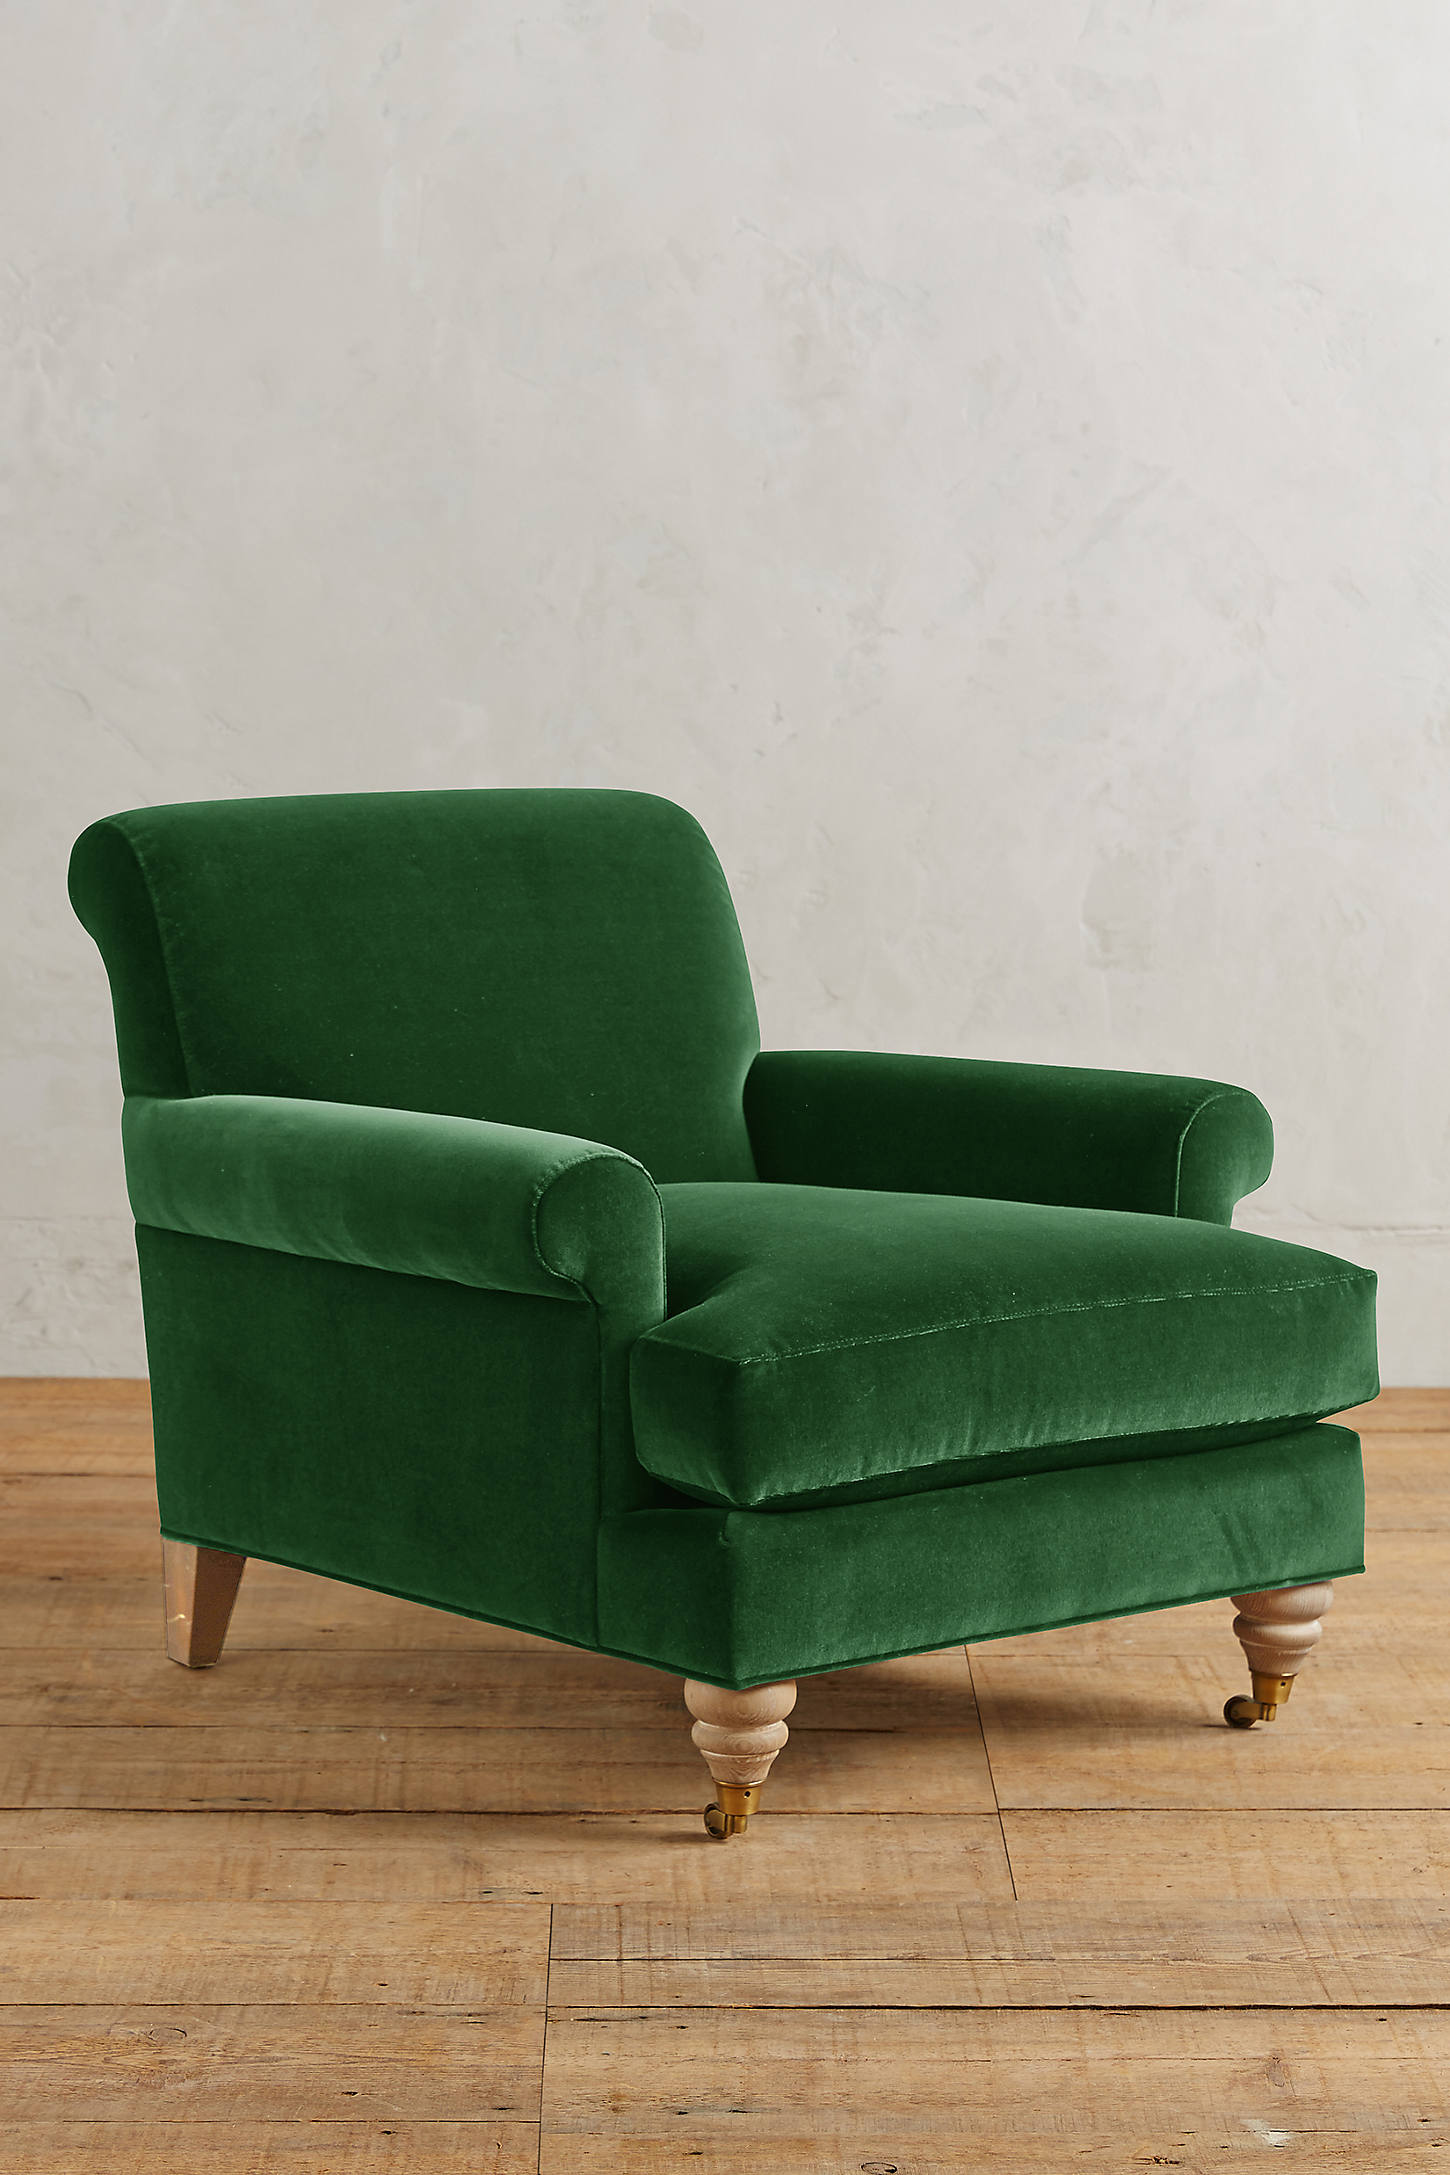 Velvet Willoughby Chair, Wilcox